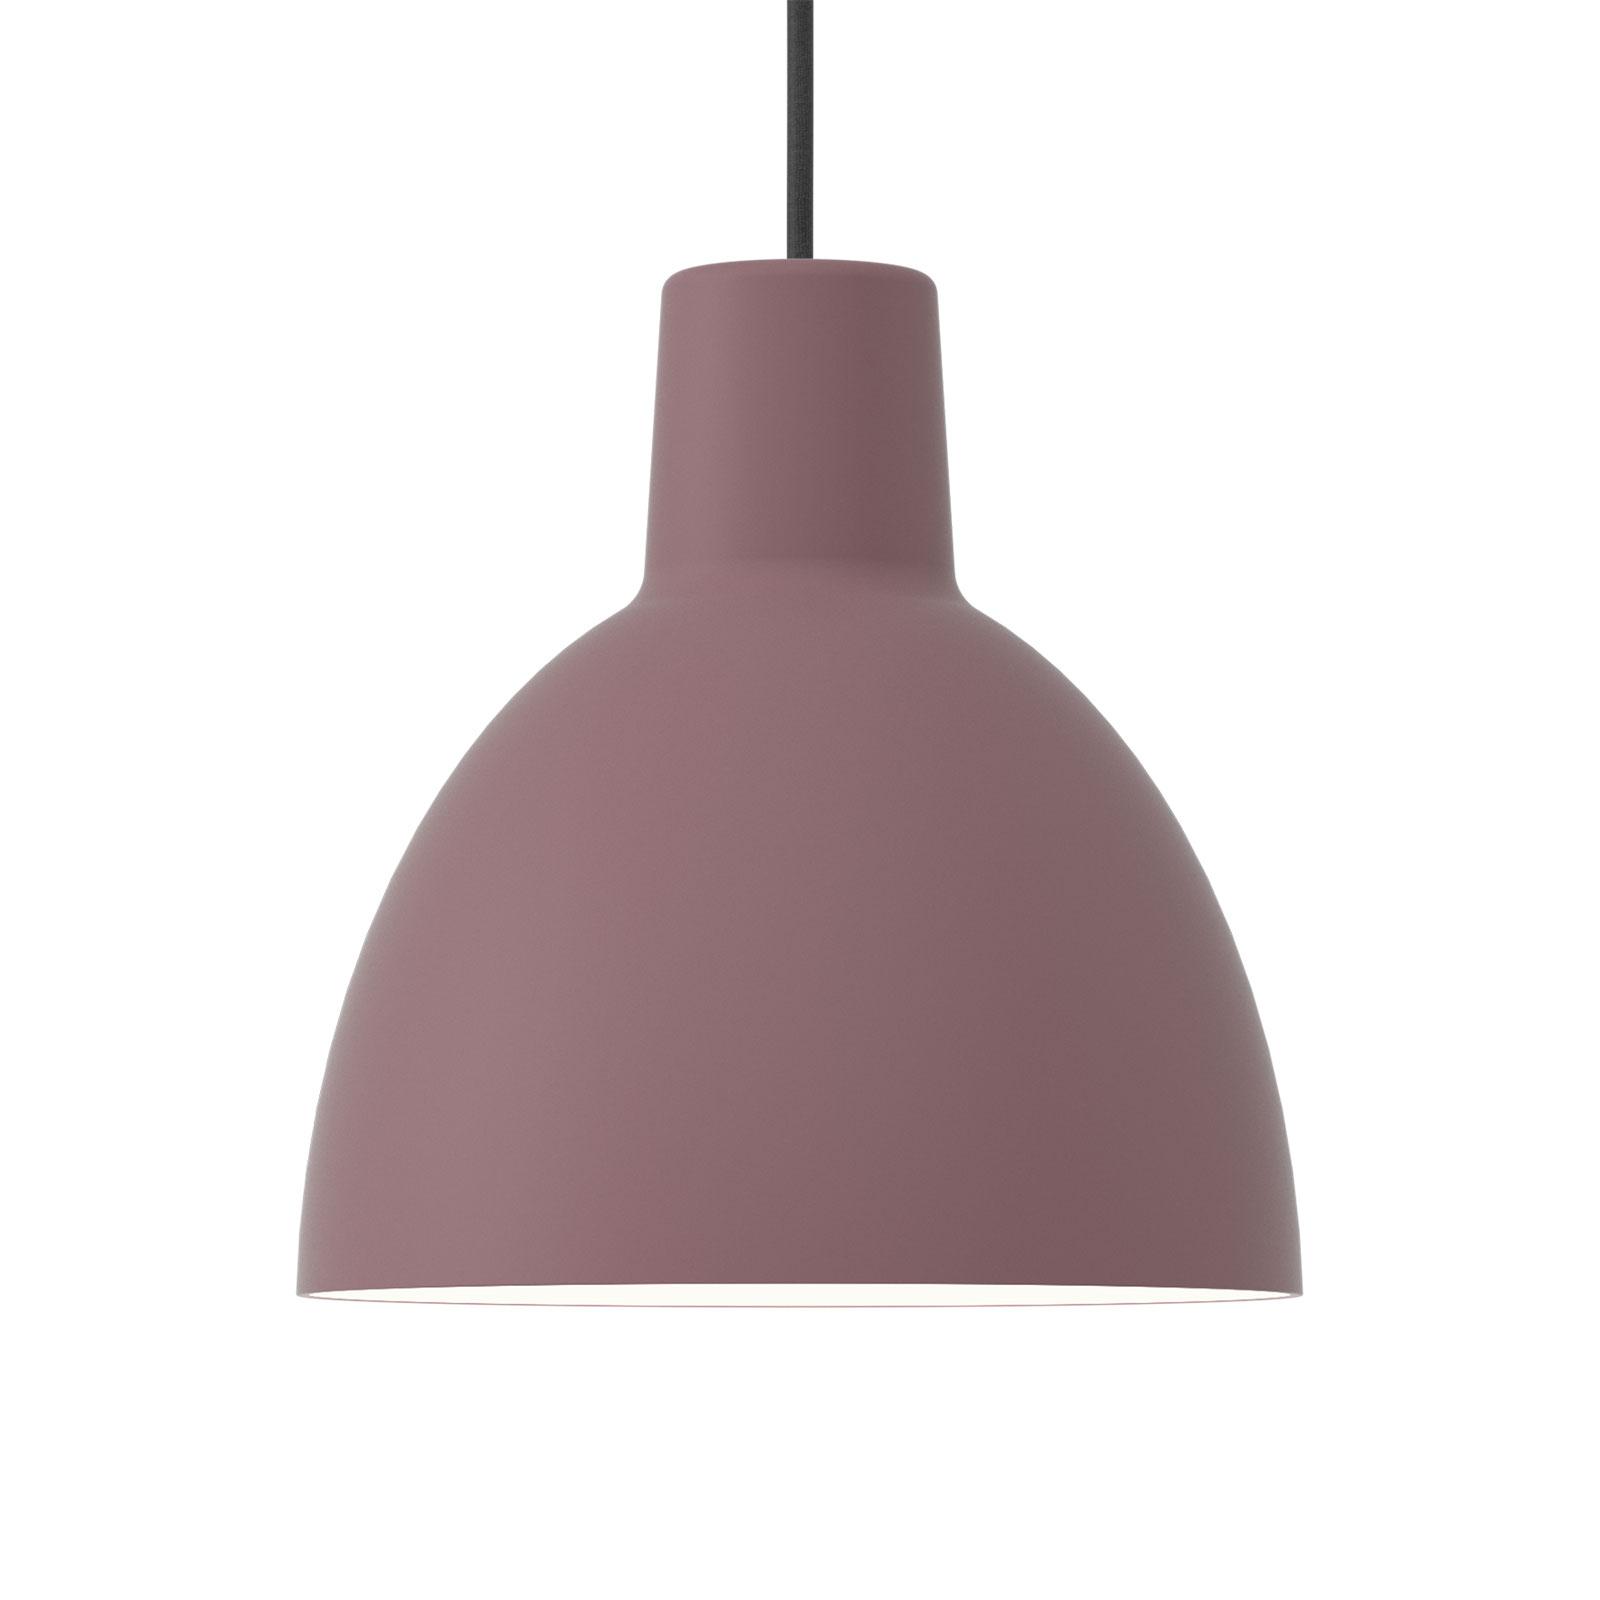 Louis Poulsen hanglamp Toldbod 250 donkerroze